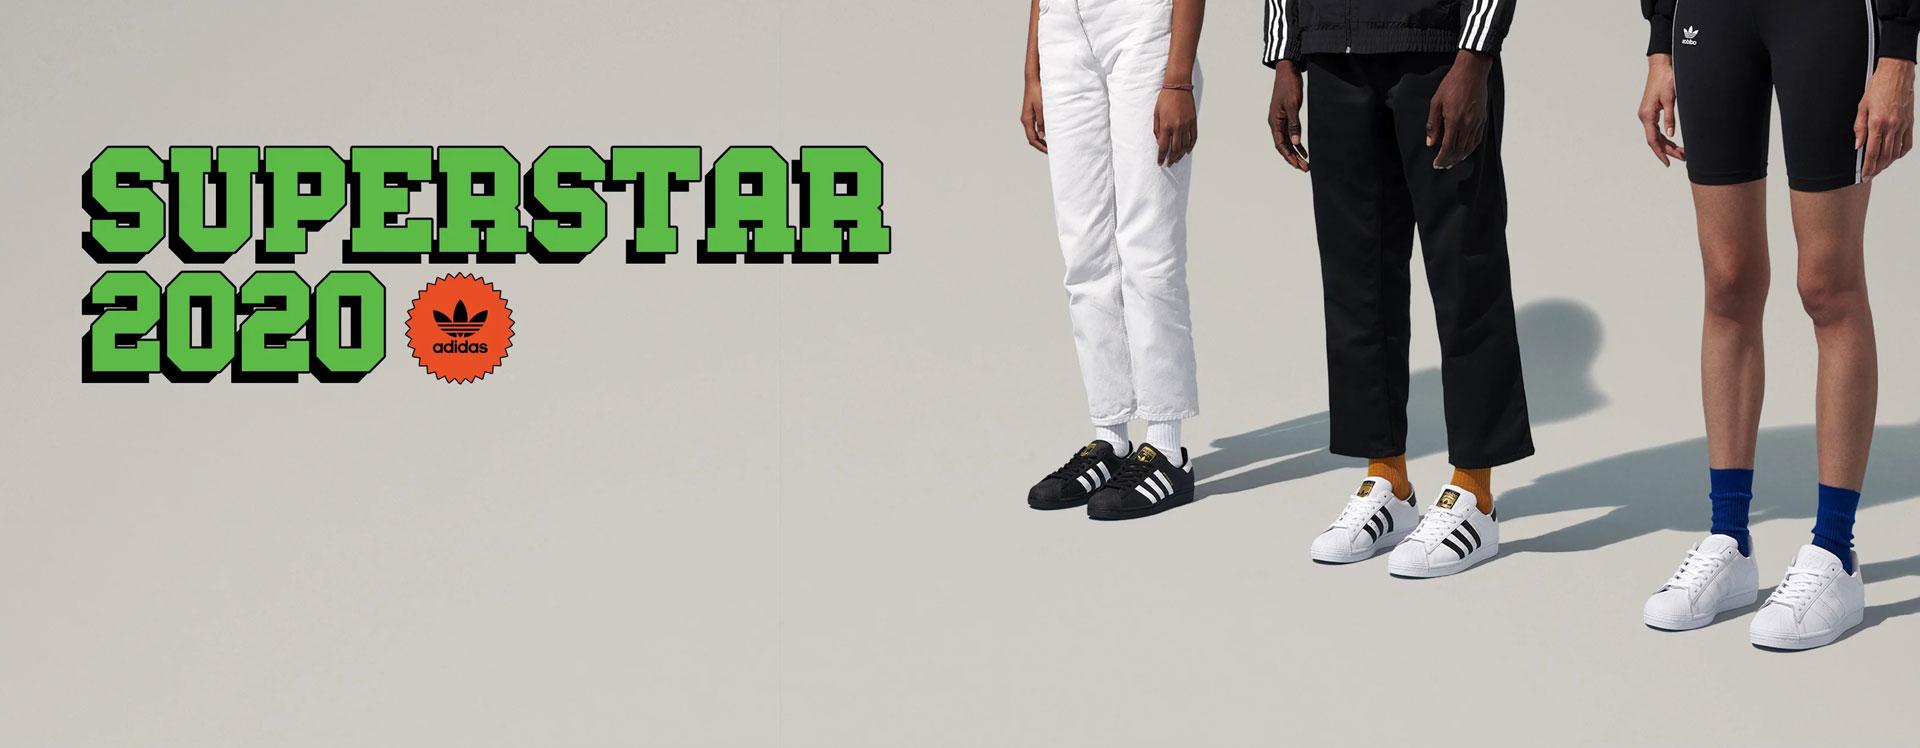 adidas Superstar 2020